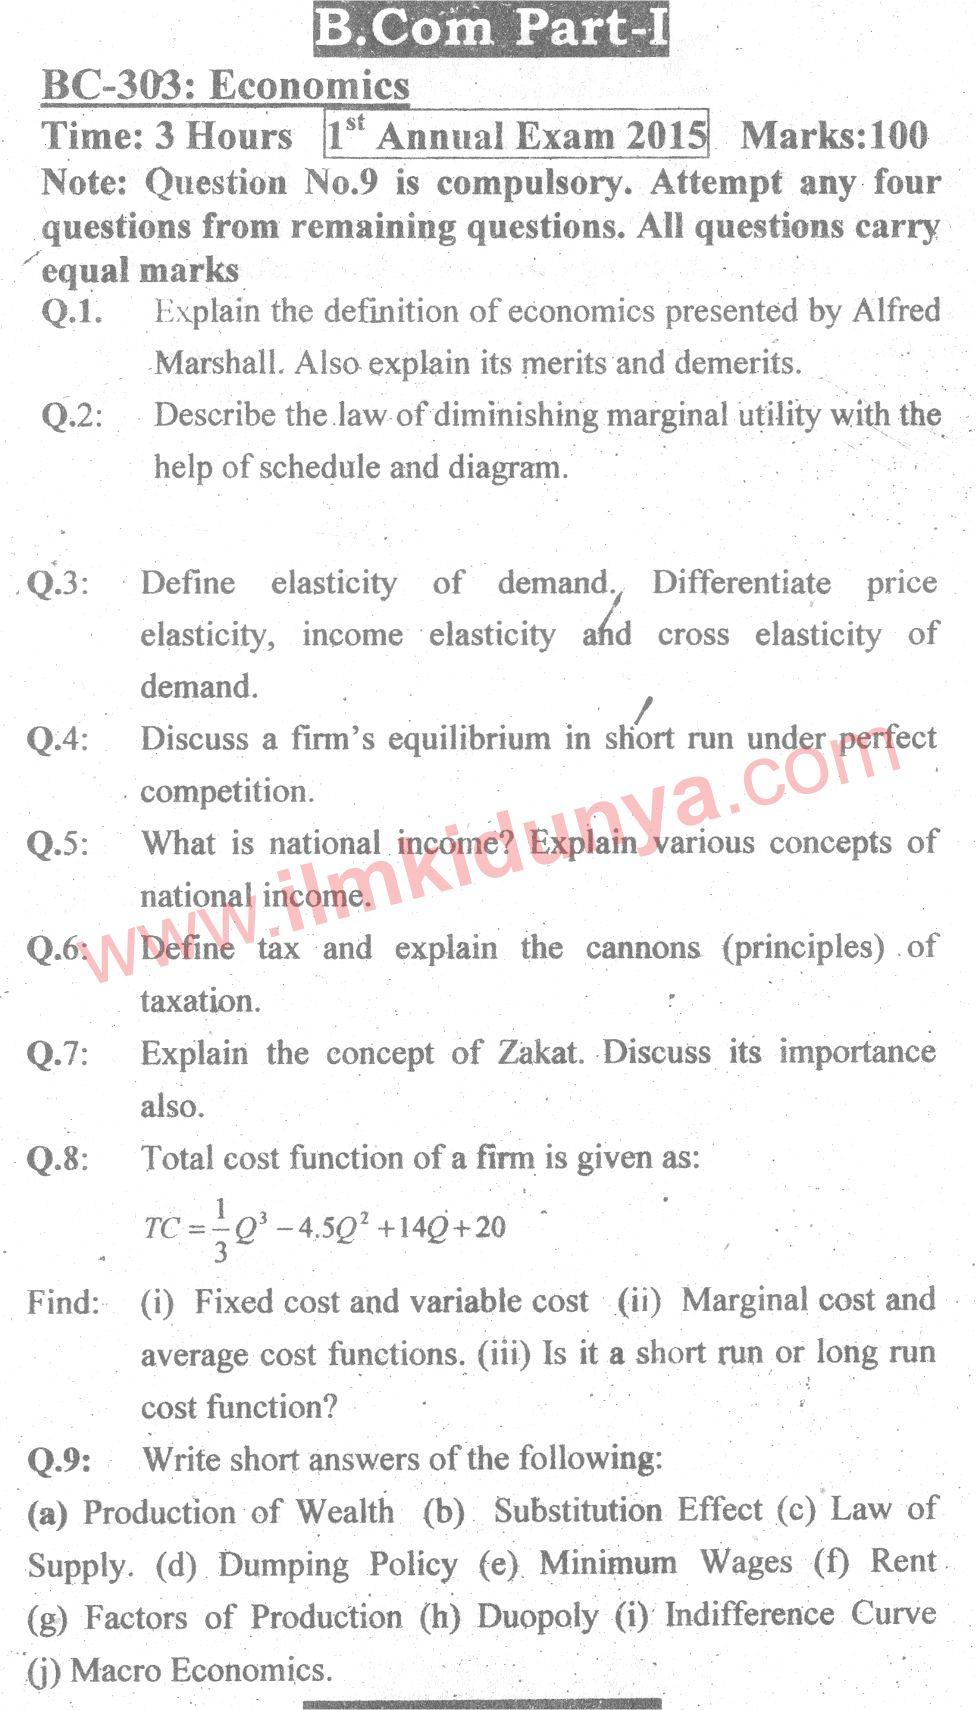 Past Paper Sargodha University 2015 BCom Part 1 Economics